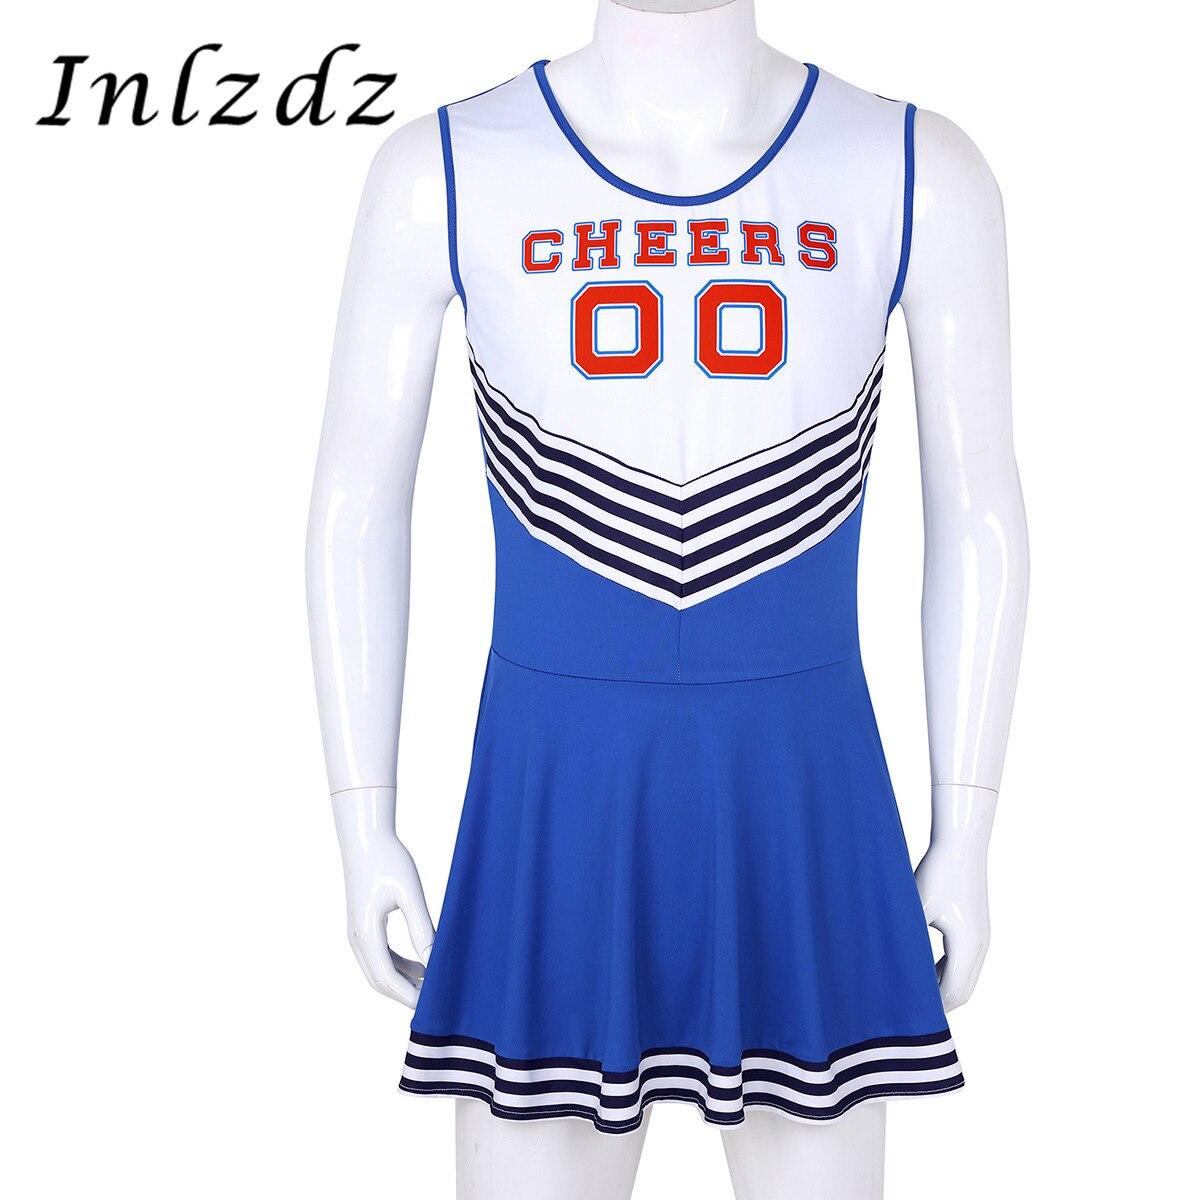 Men Sissy Charming Cheerleader Cosplay Costume Dress Scoop Neck Sleeveless Pleated Fancy Cheerleading Sissy Sexy Short Dress